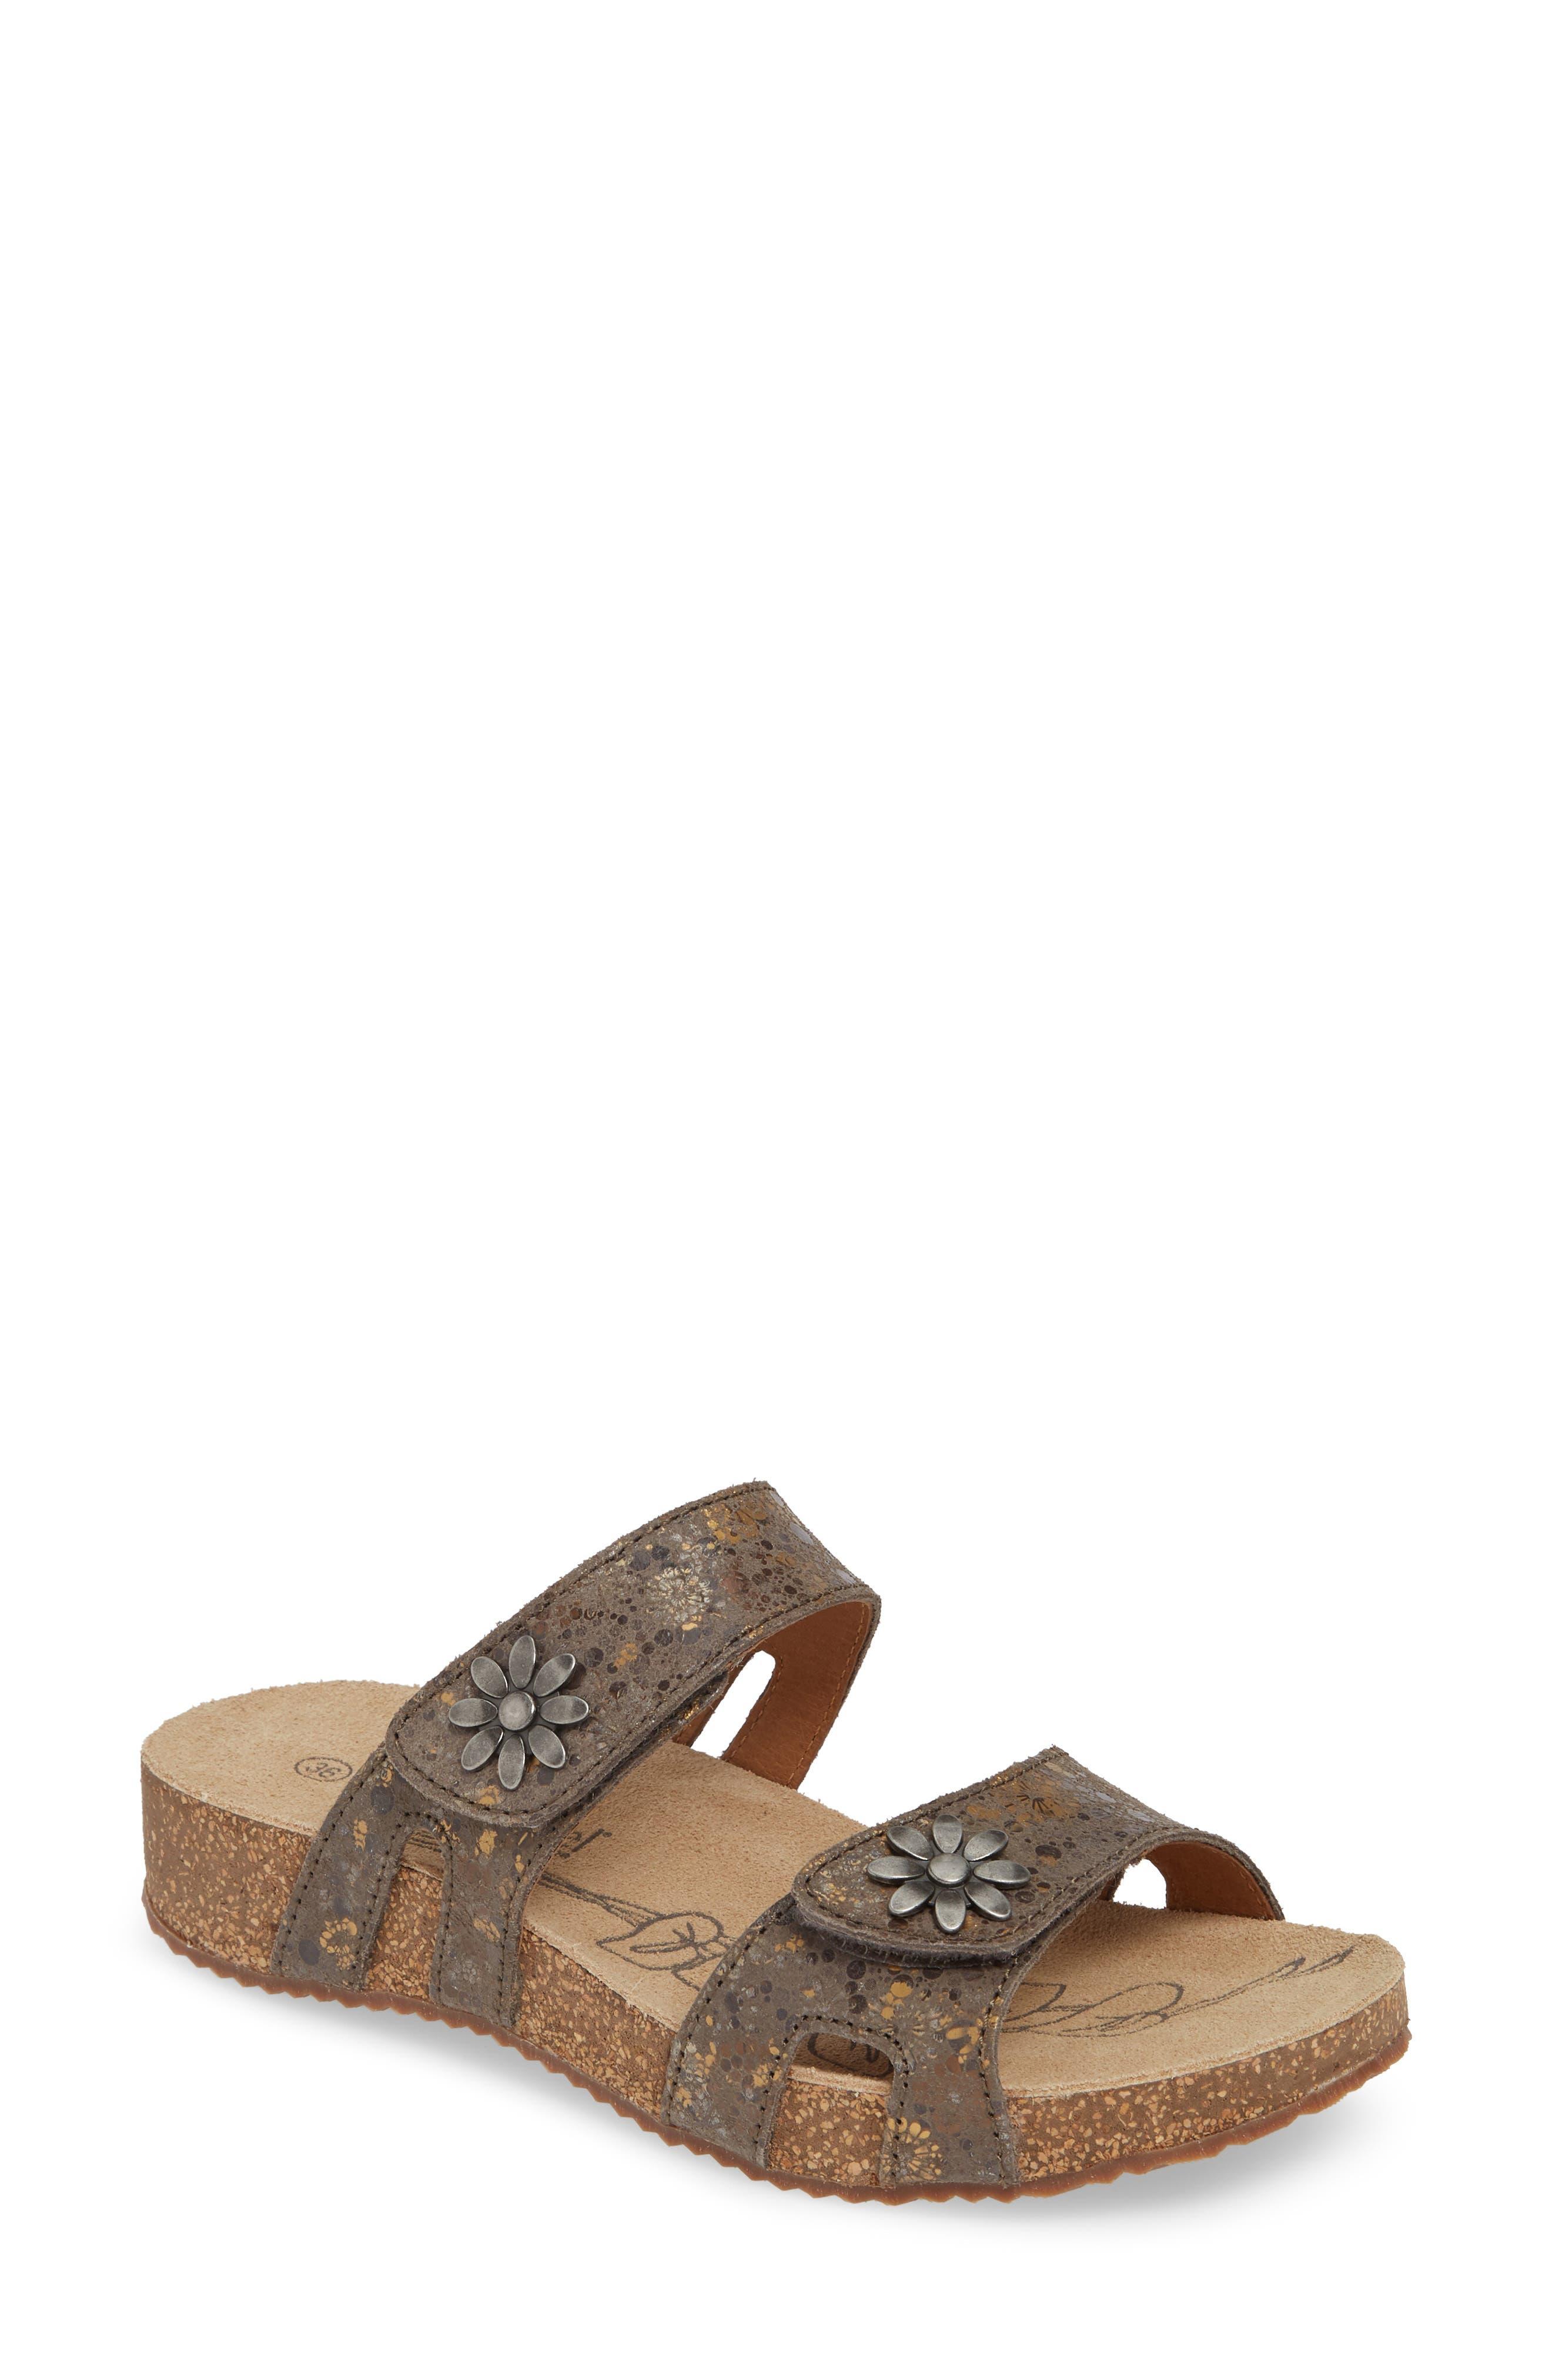 'Tonga 04' Sandal